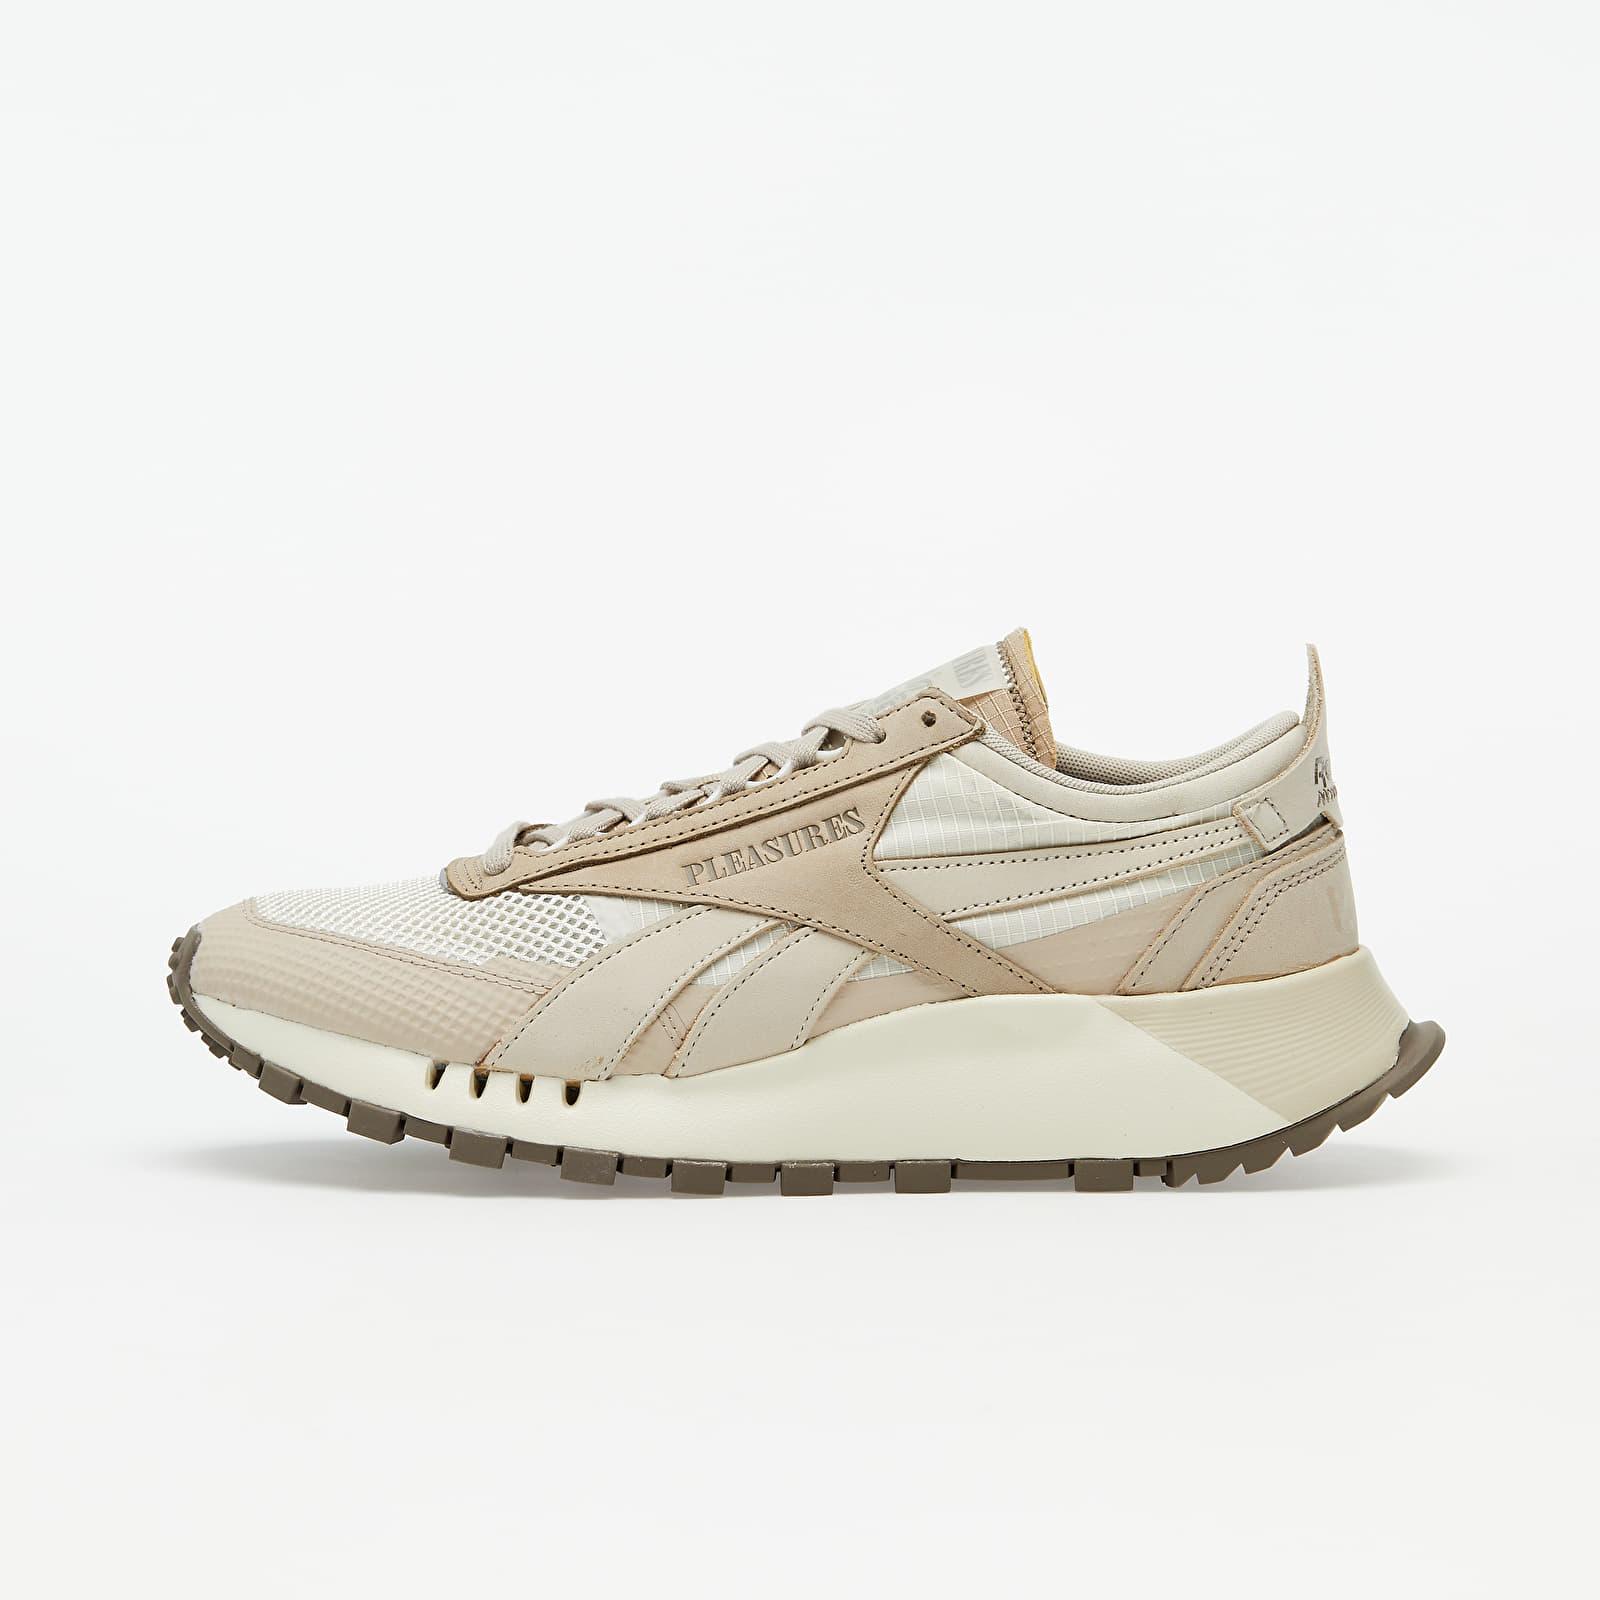 Men's shoes Reebok x Pleasures Classic